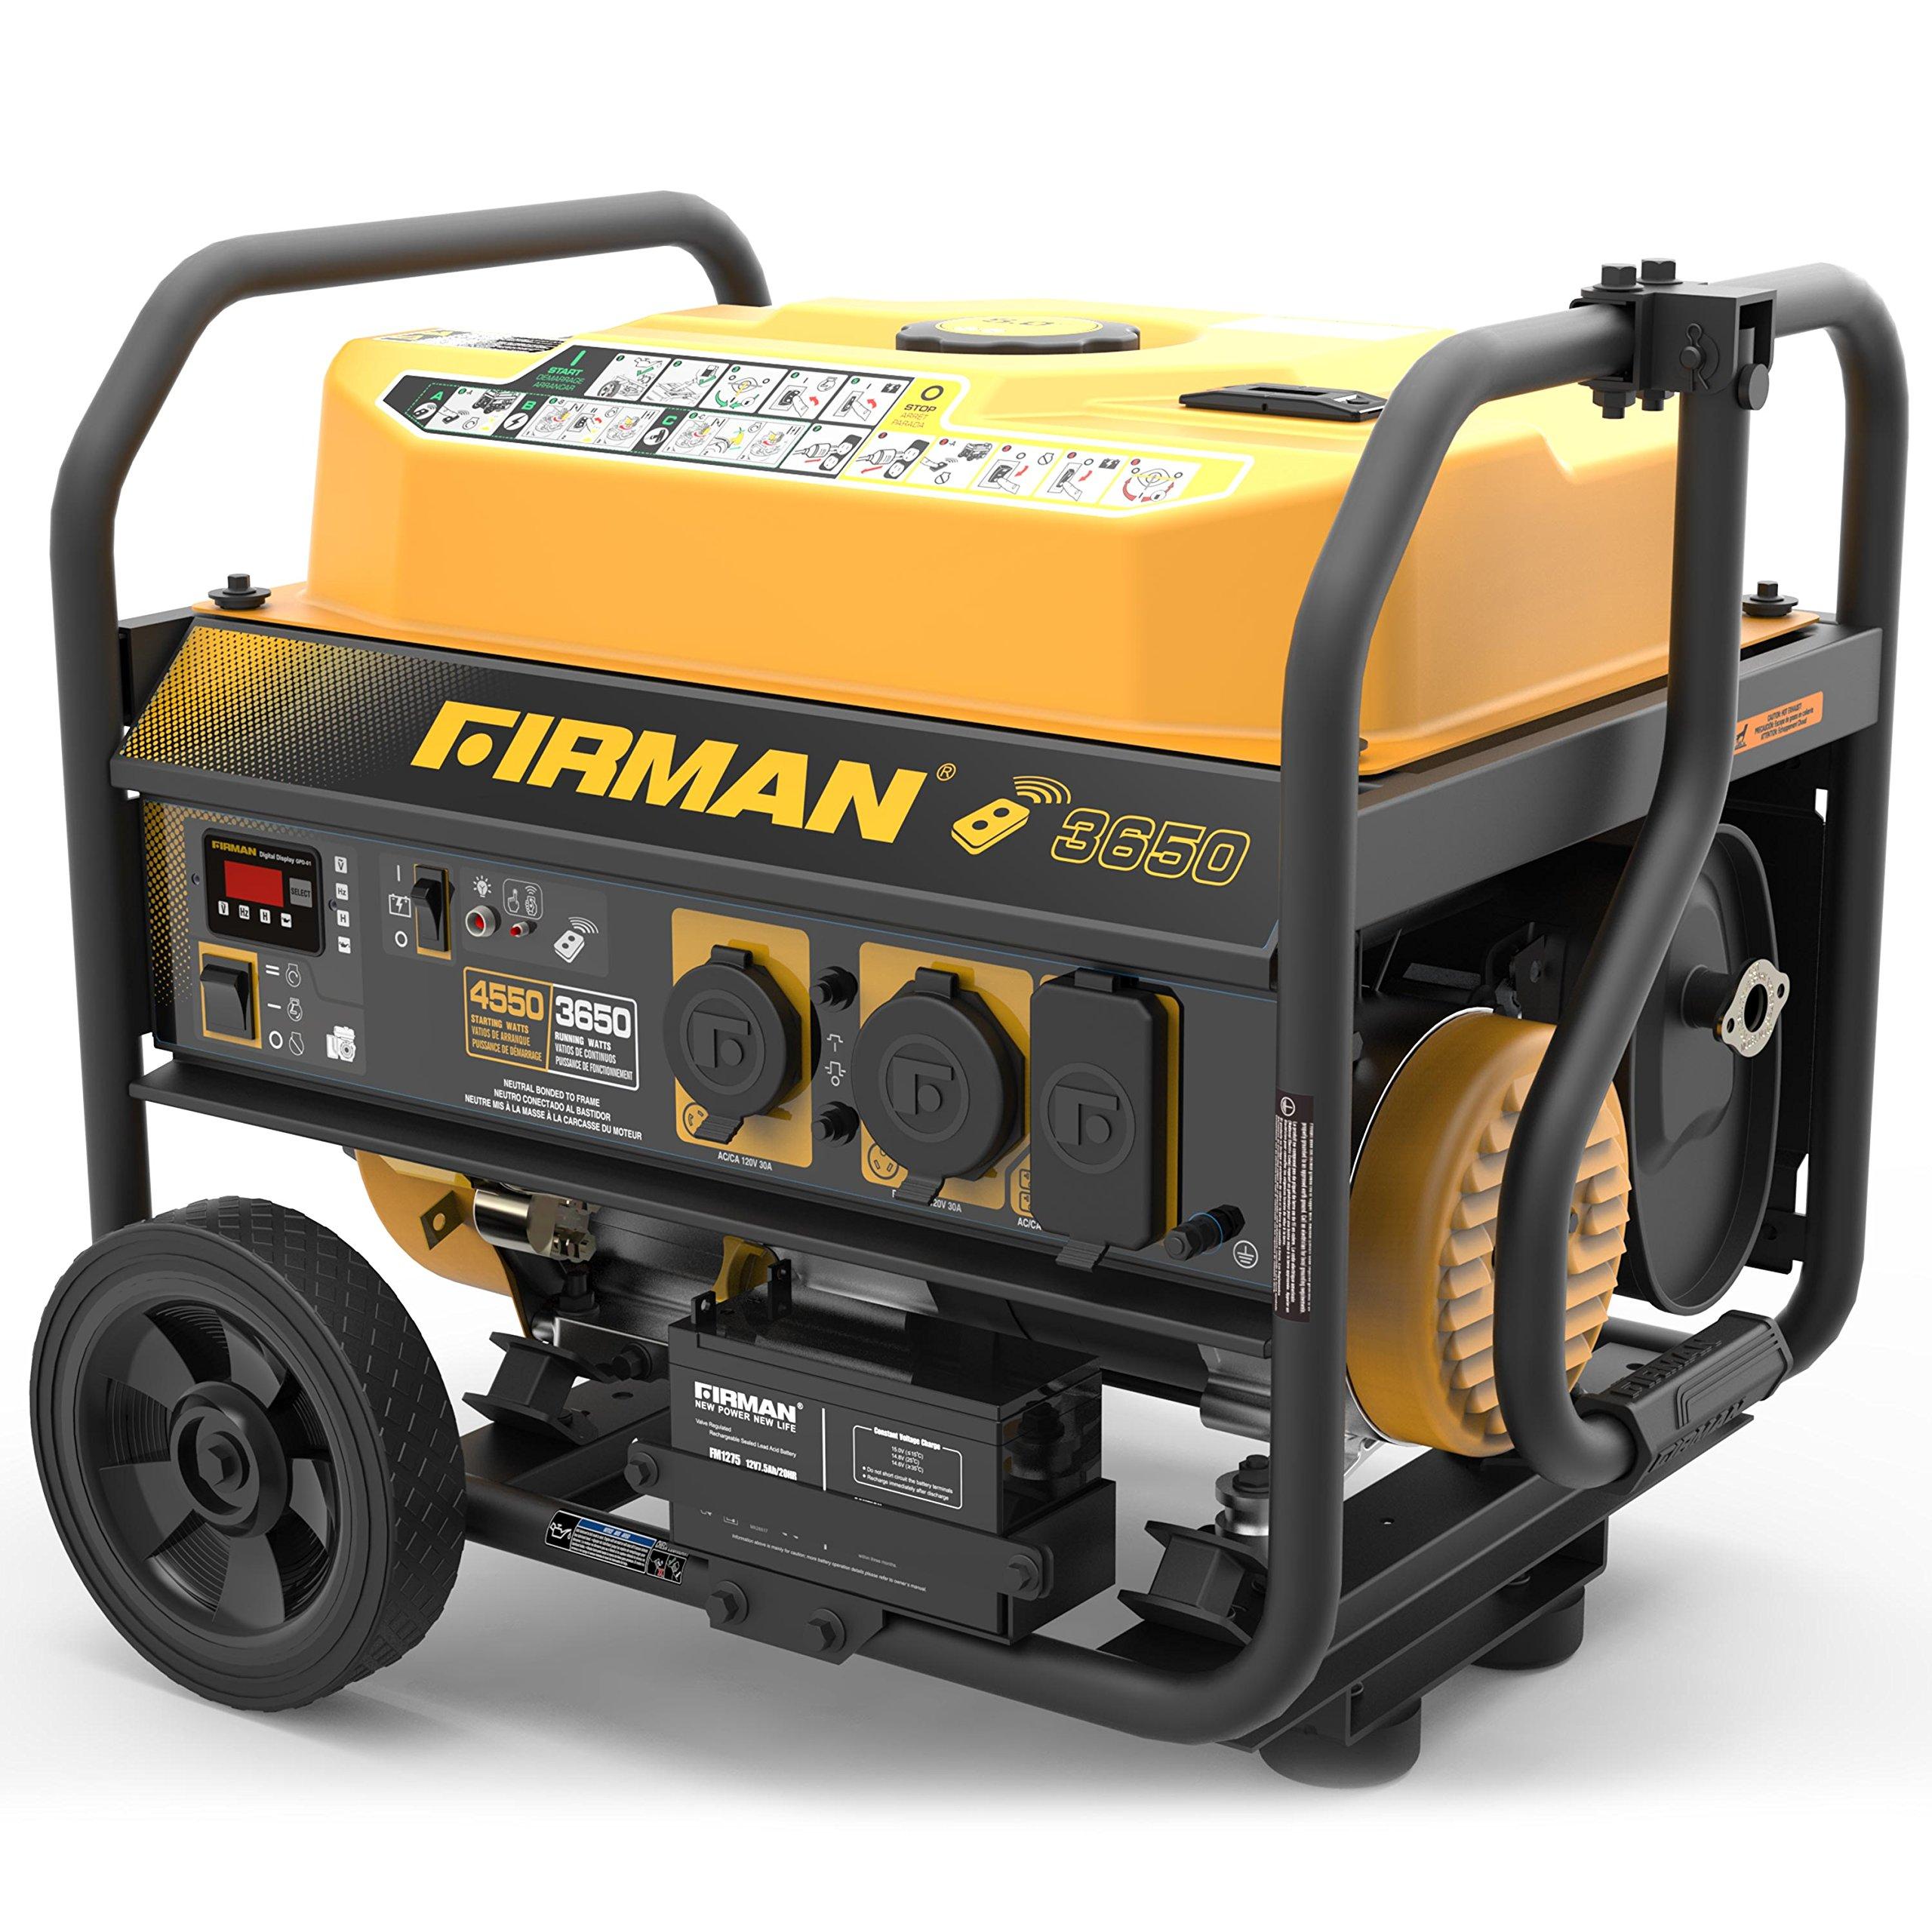 Firman P03608 4550/3650 Watt Remote Start Gas Portable Generator CARB Certified with Wheel Kit, Yellow by Firman